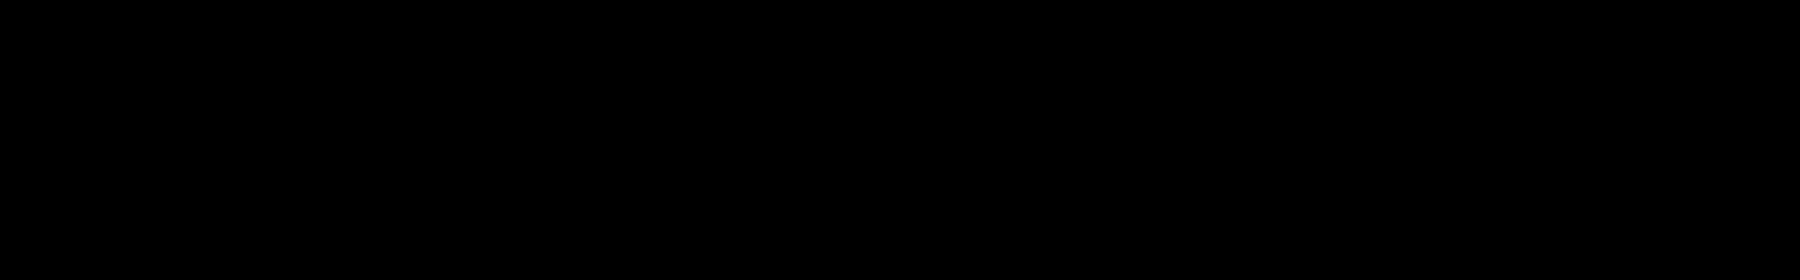 Psytrance Chakra audio waveform